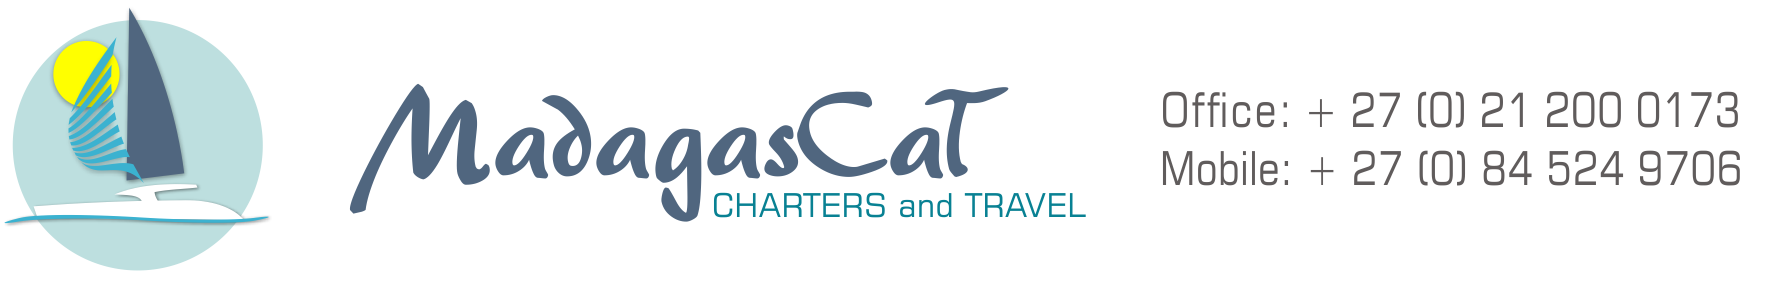 Madagascat_new_header3 (1).png